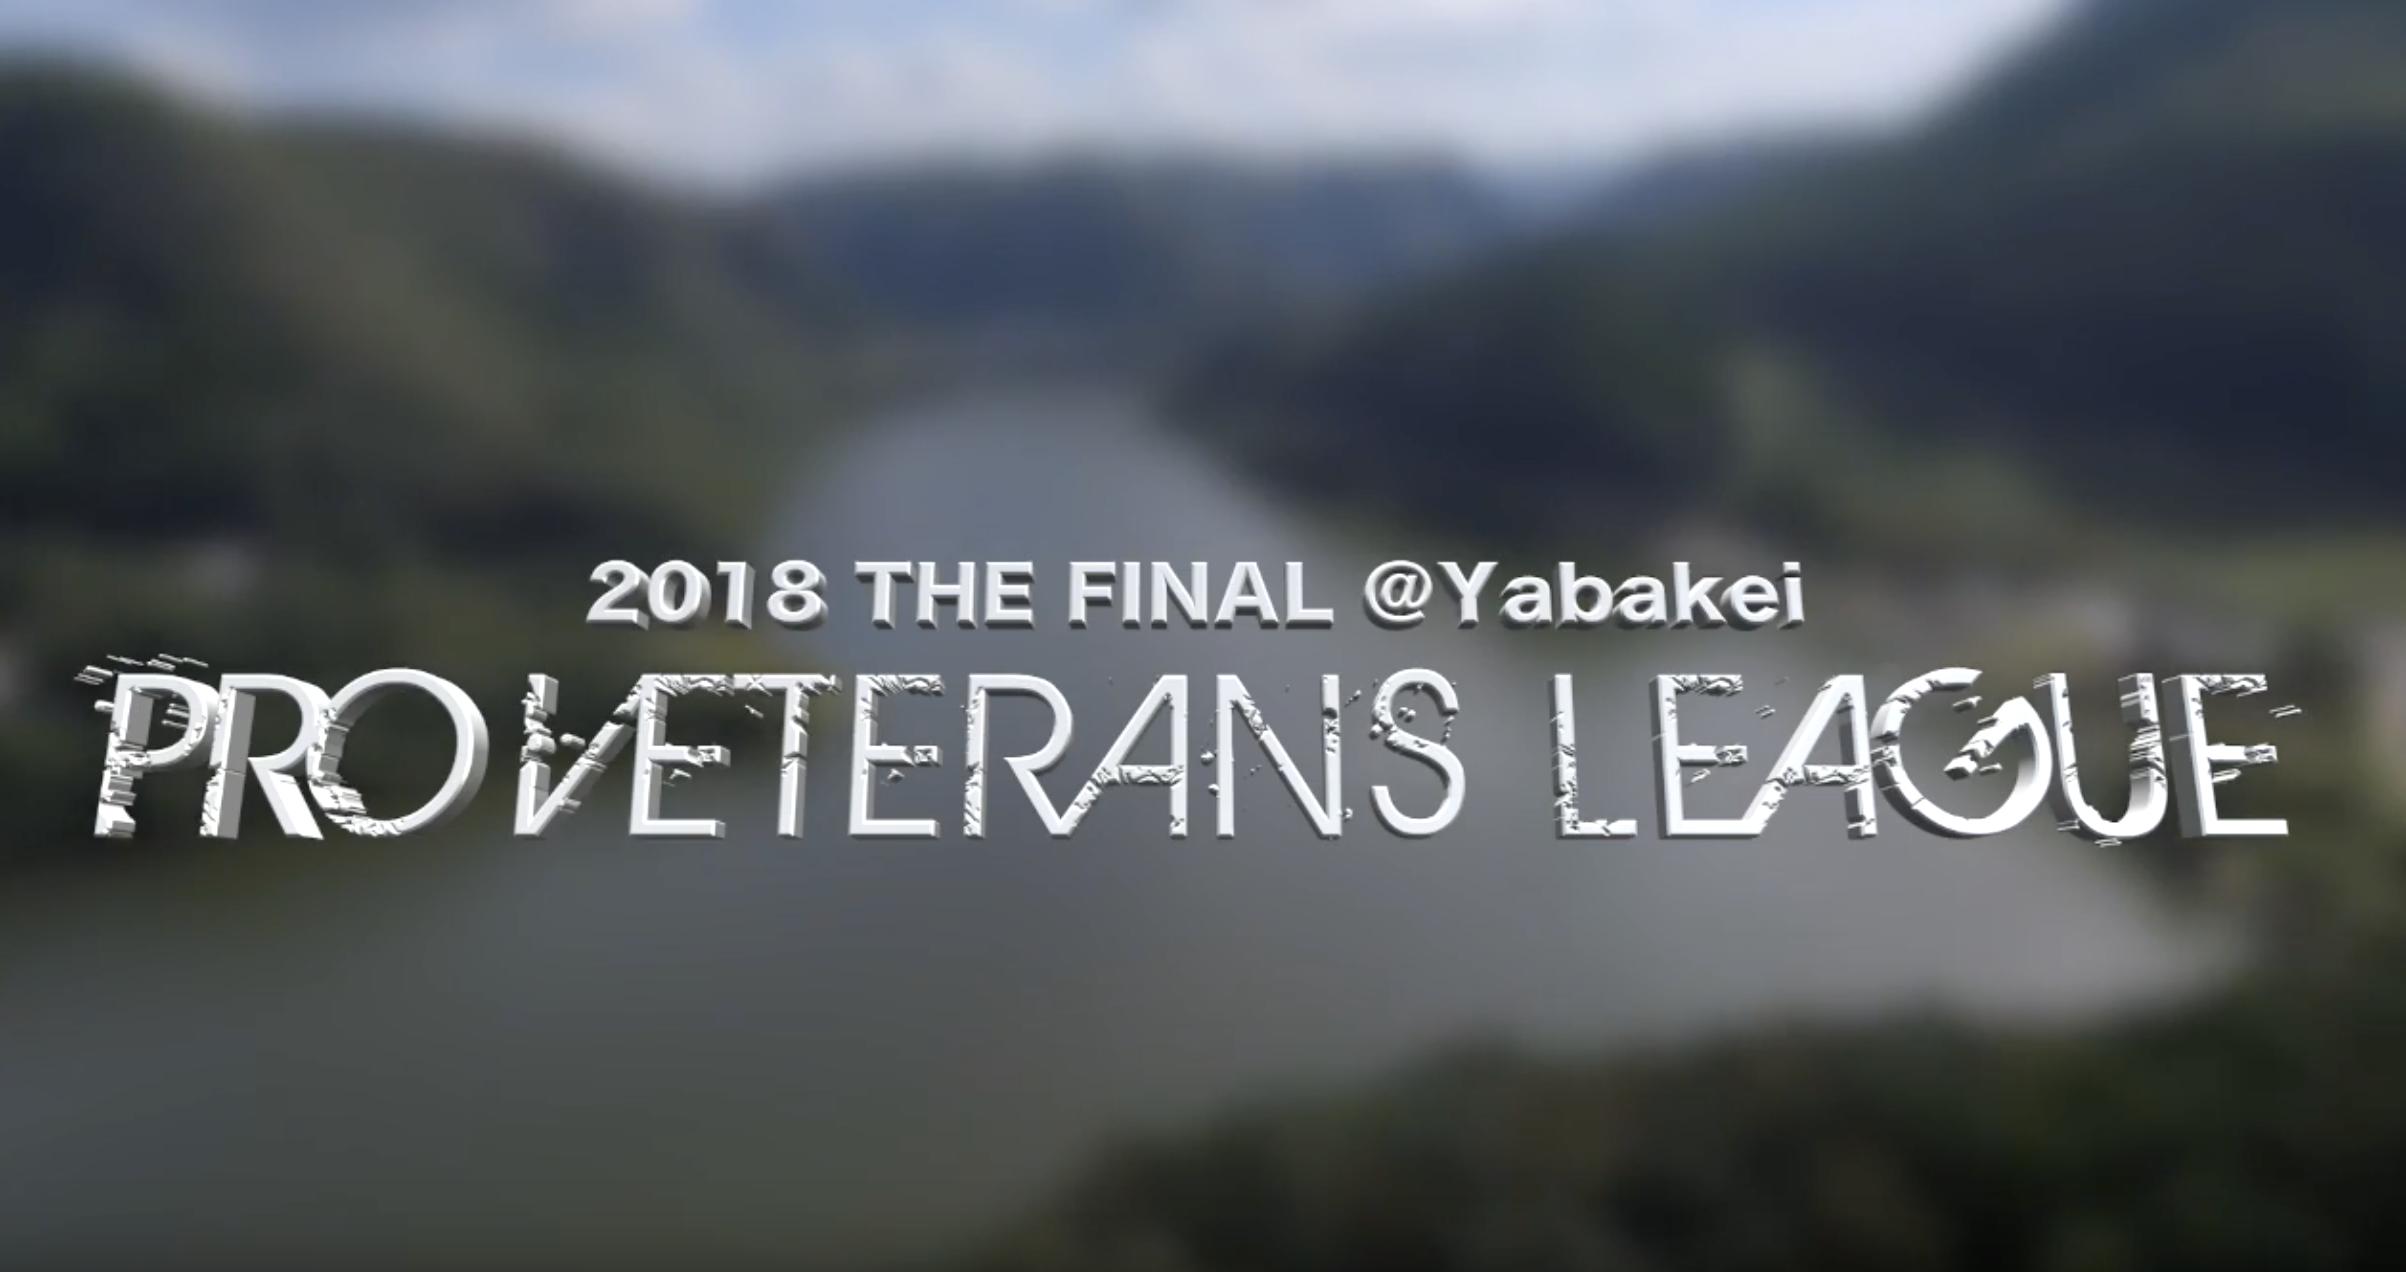 '18 #5 CHAMPIONS LAGUE FINAL <TOP3のライディング>  @Yabakei